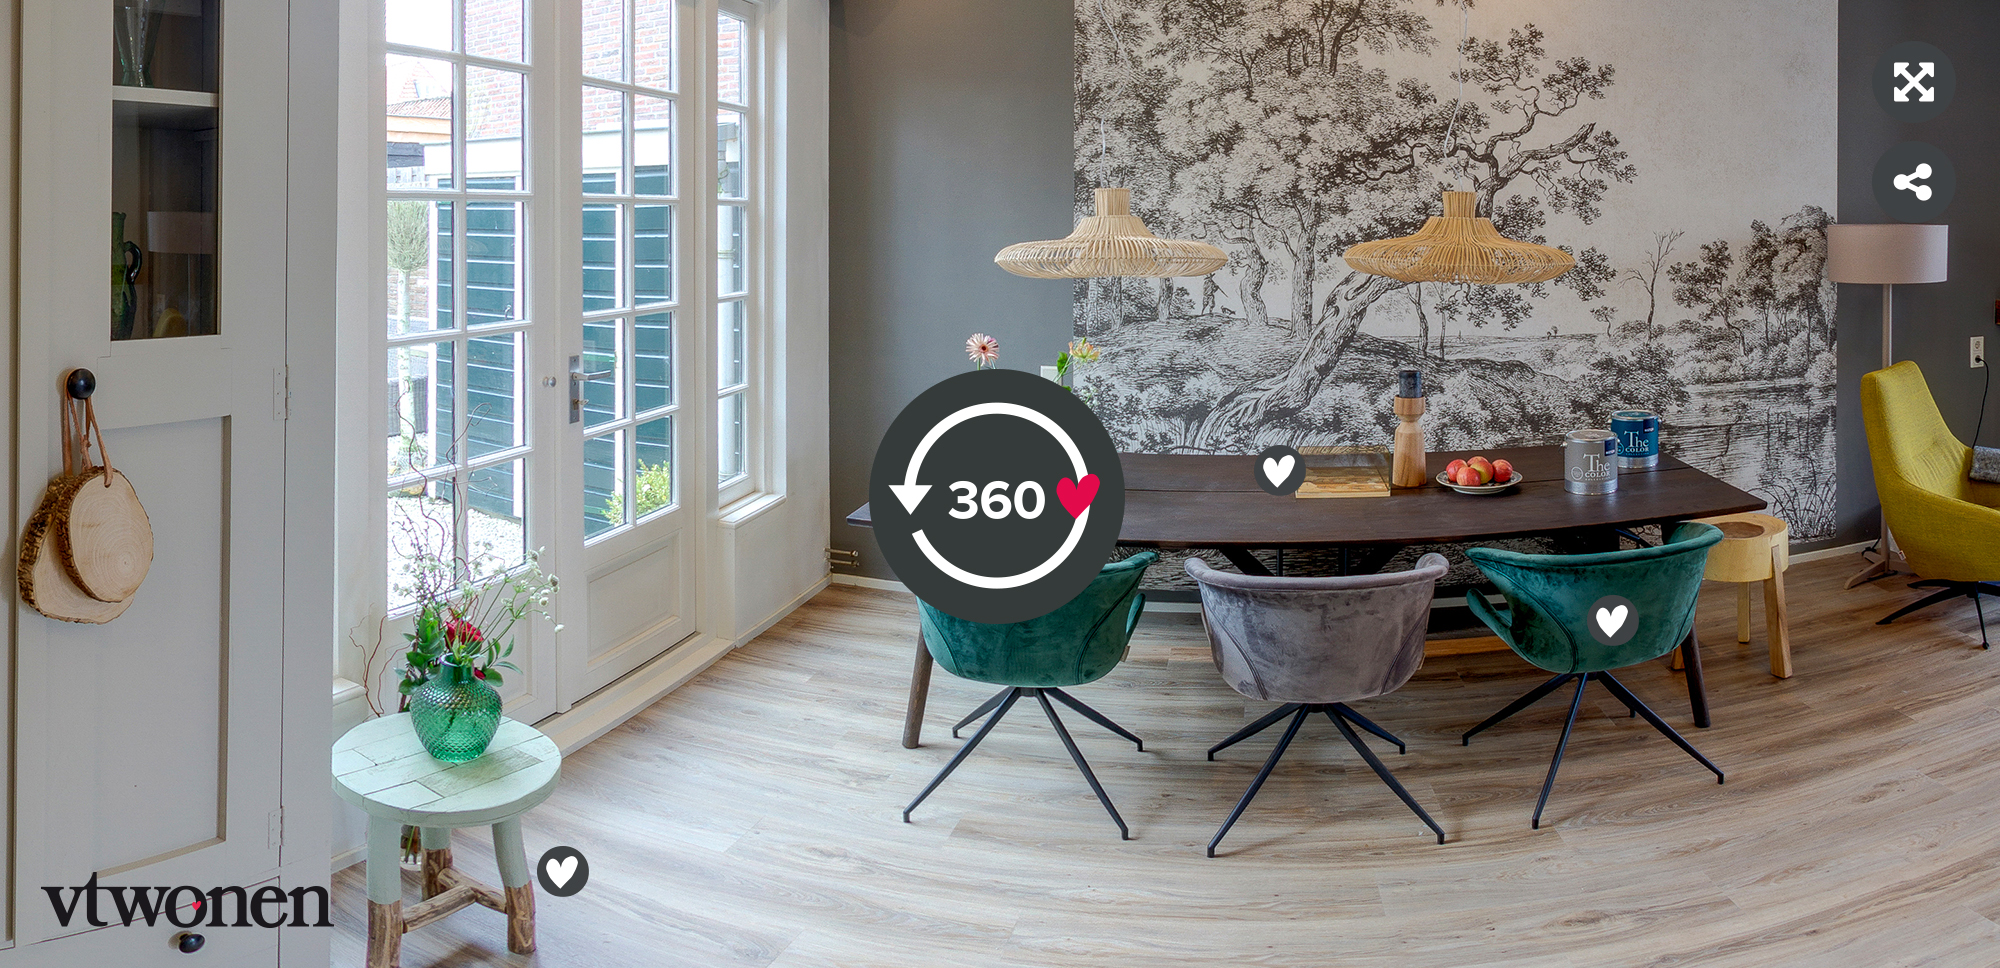 360 tour weer verliefd op je huis aflevering 5